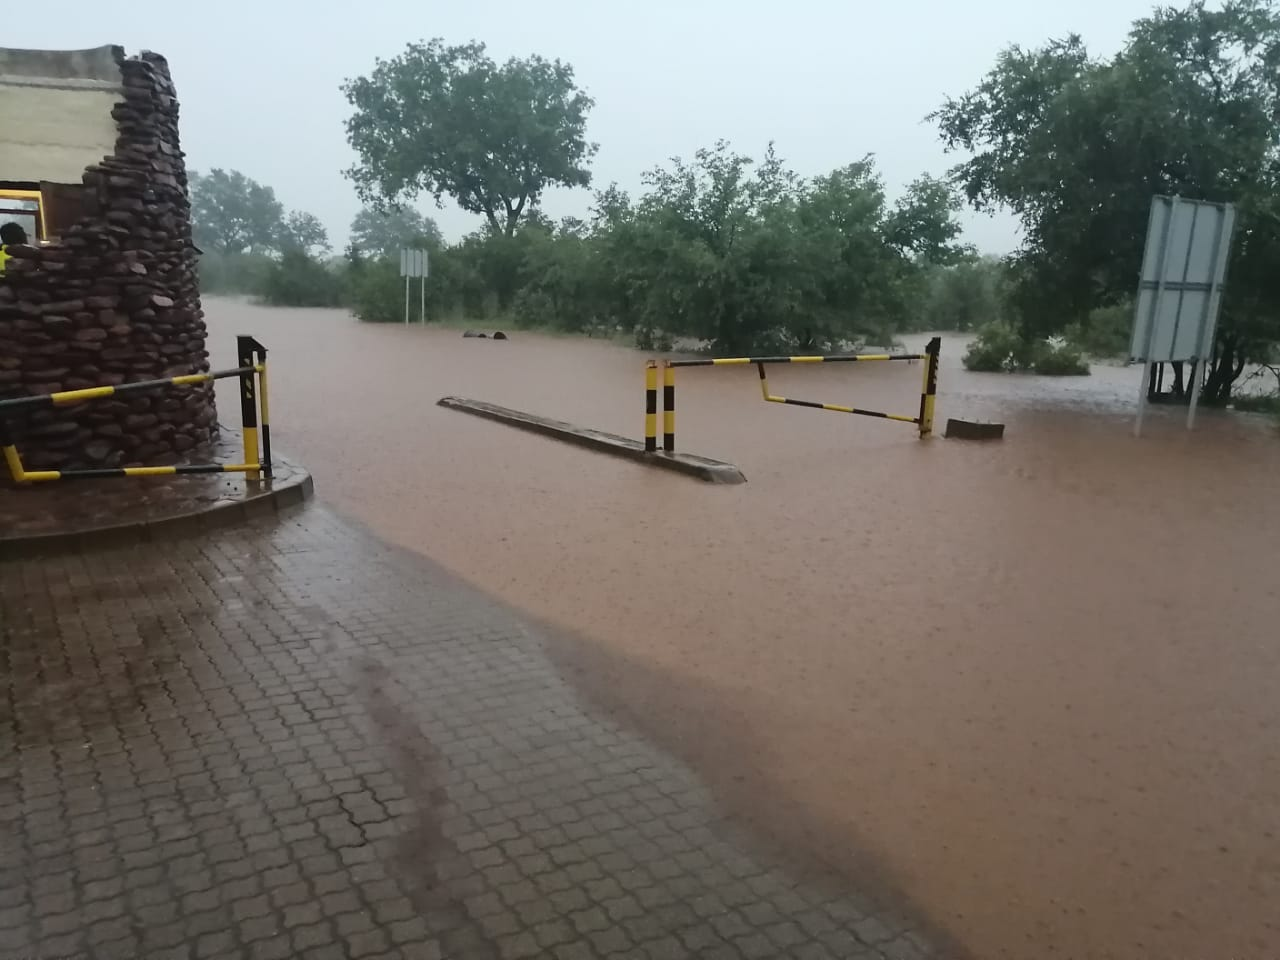 punda maria gate kruger national park south africa heavy rain flooding